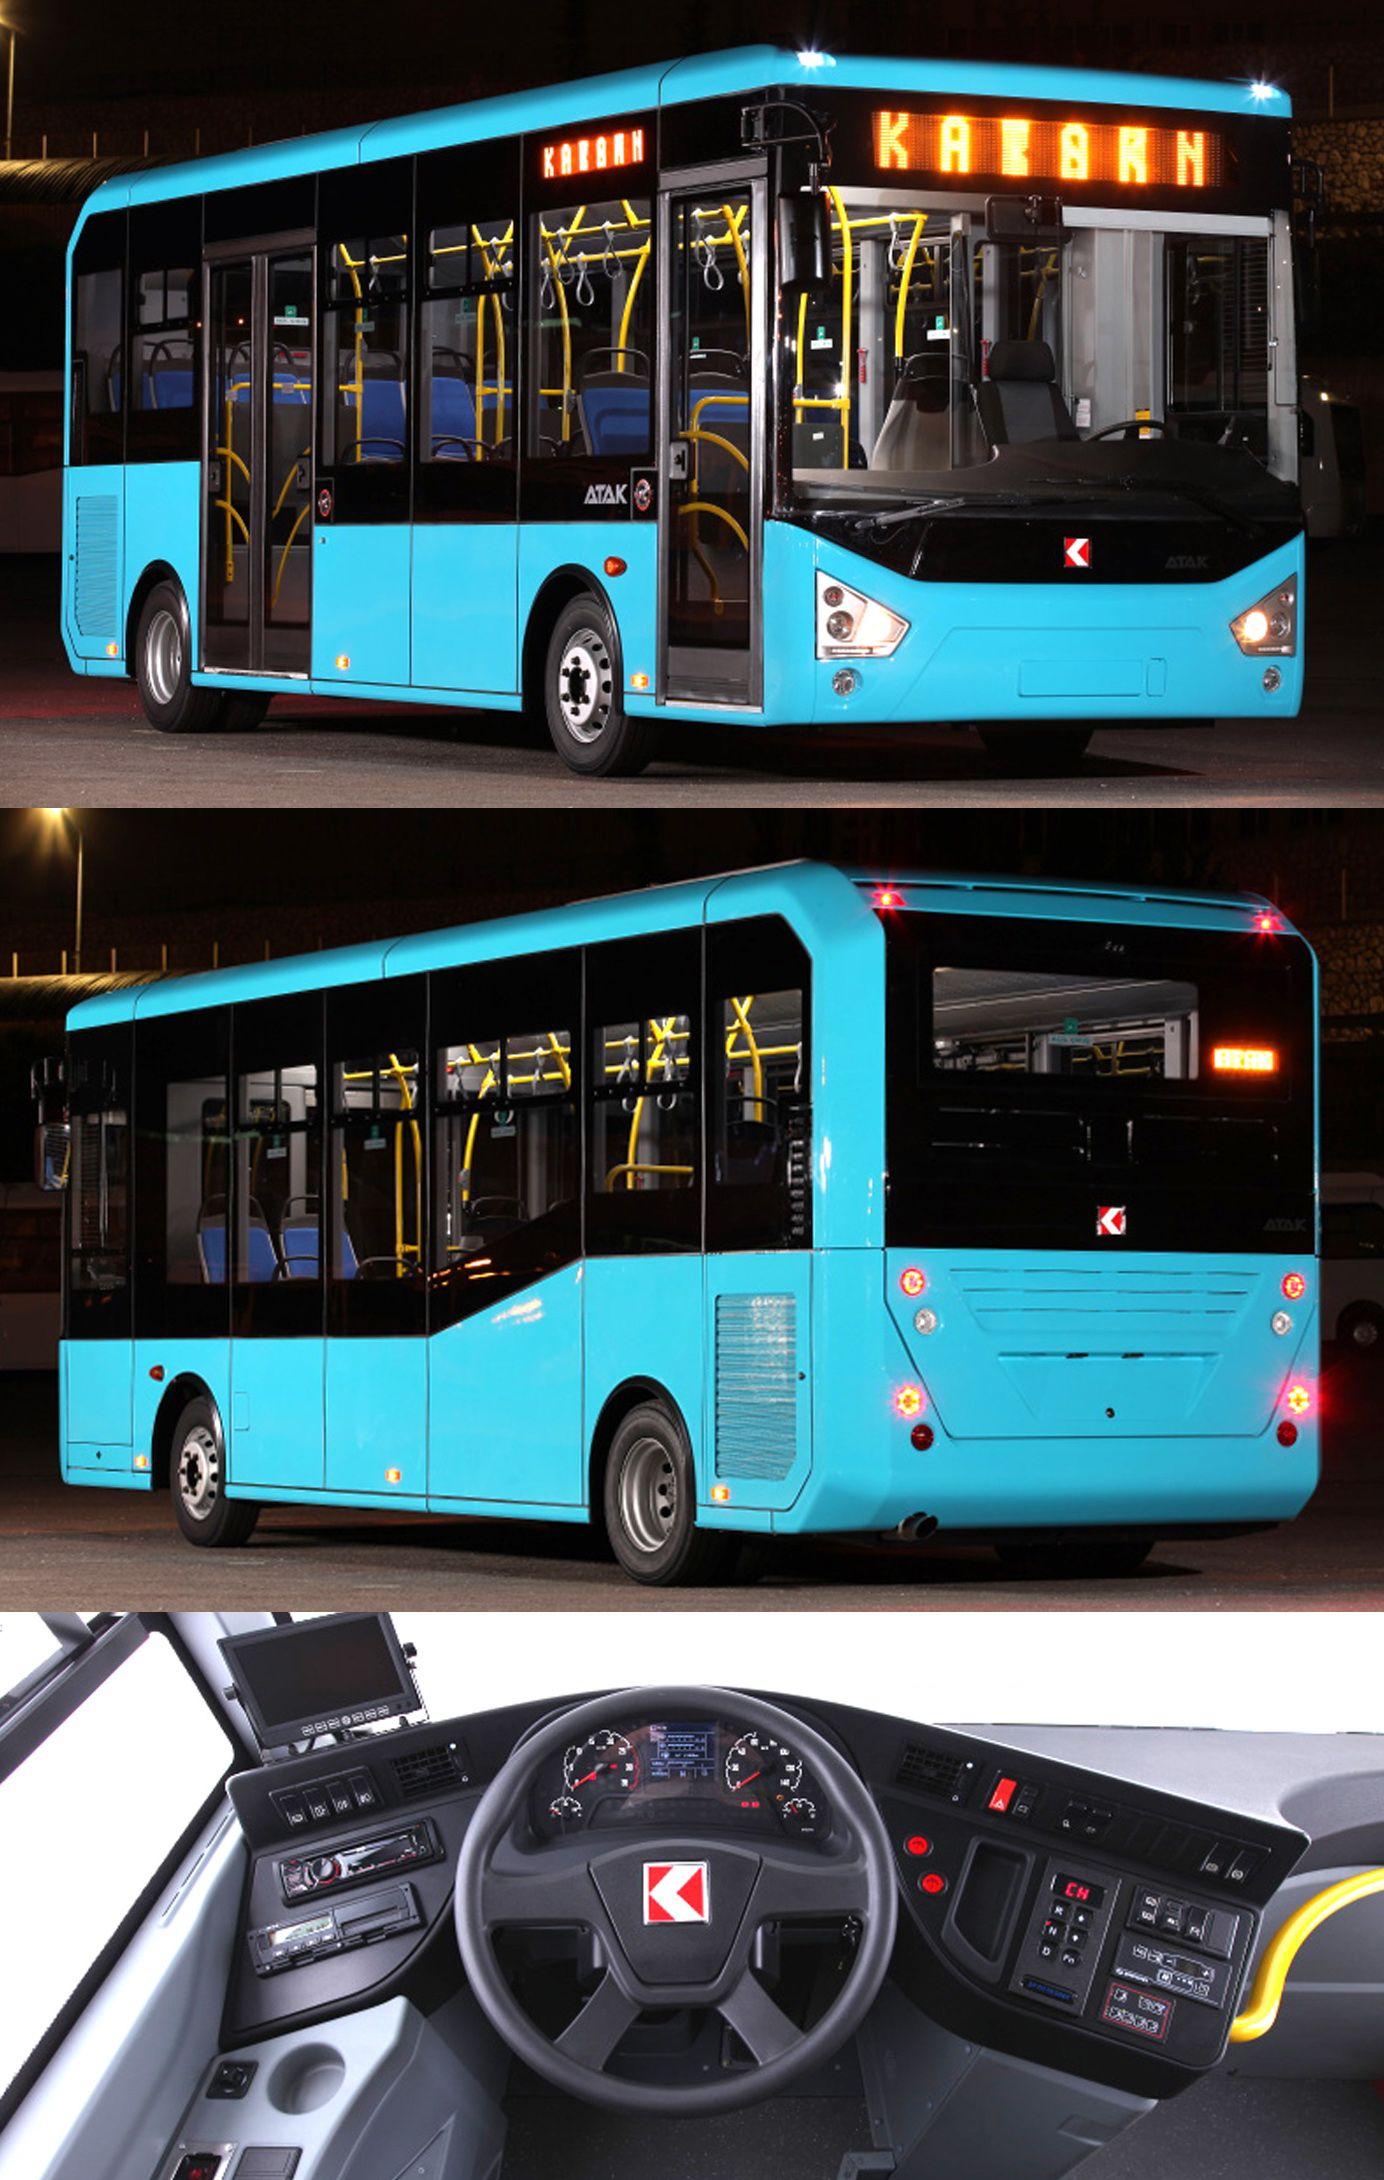 Karsan Atak 8 m City Bus / Design: K.Kunter Aytekin | Luxury bus, Train vacations, Buses and trains